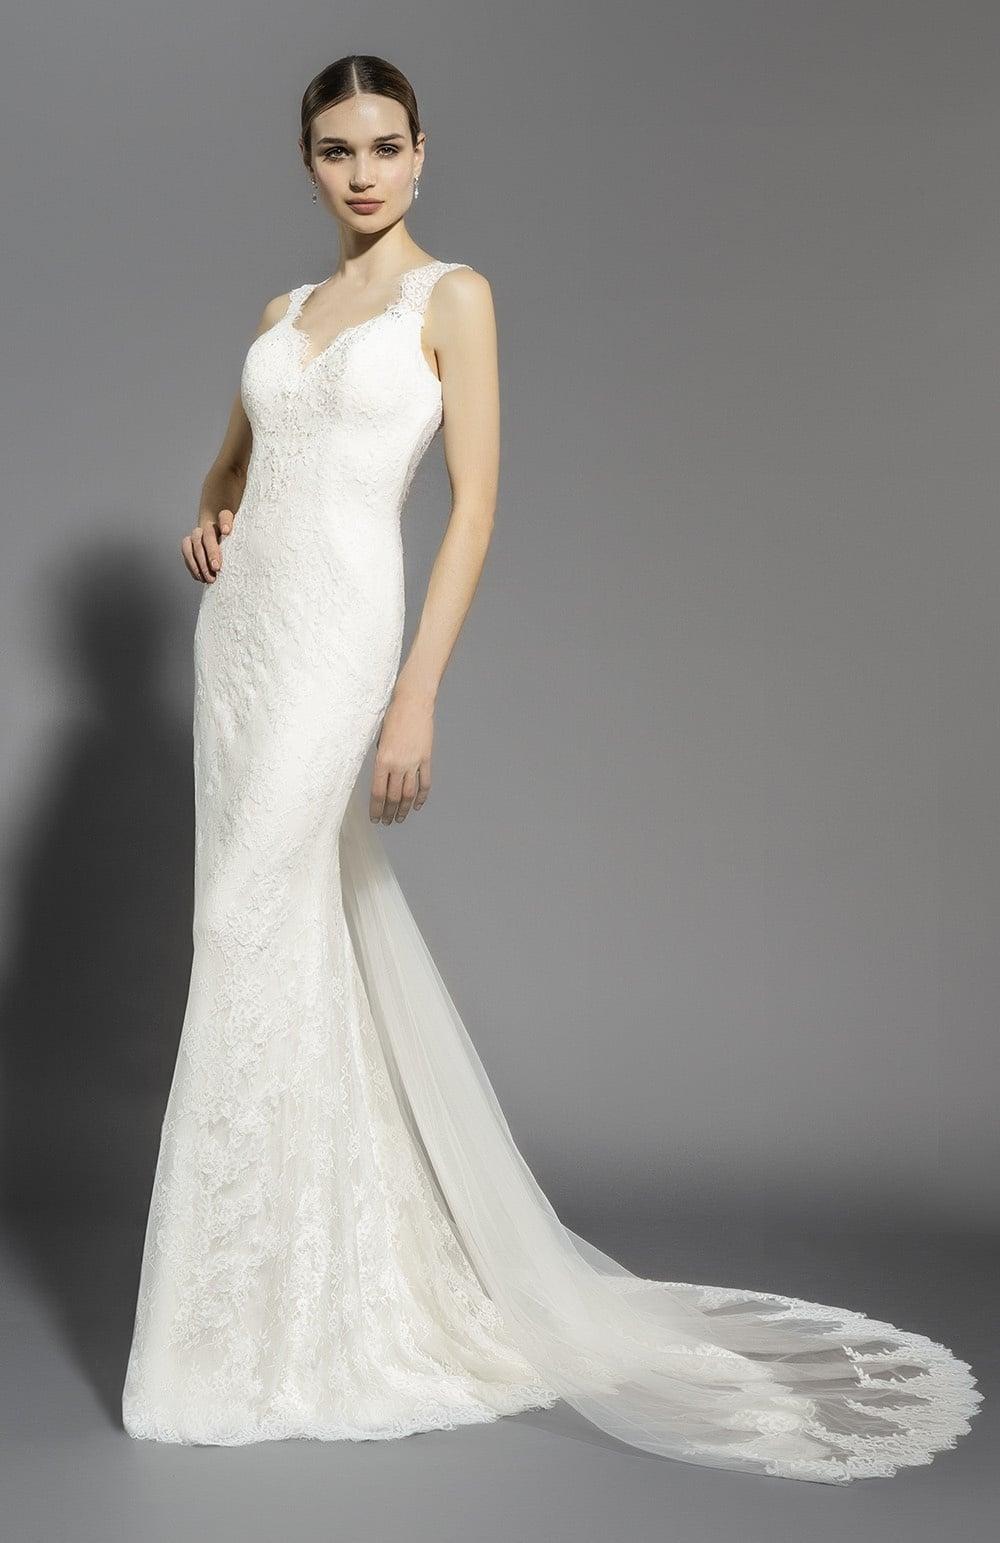 Robe de mariée Modèle Maryse